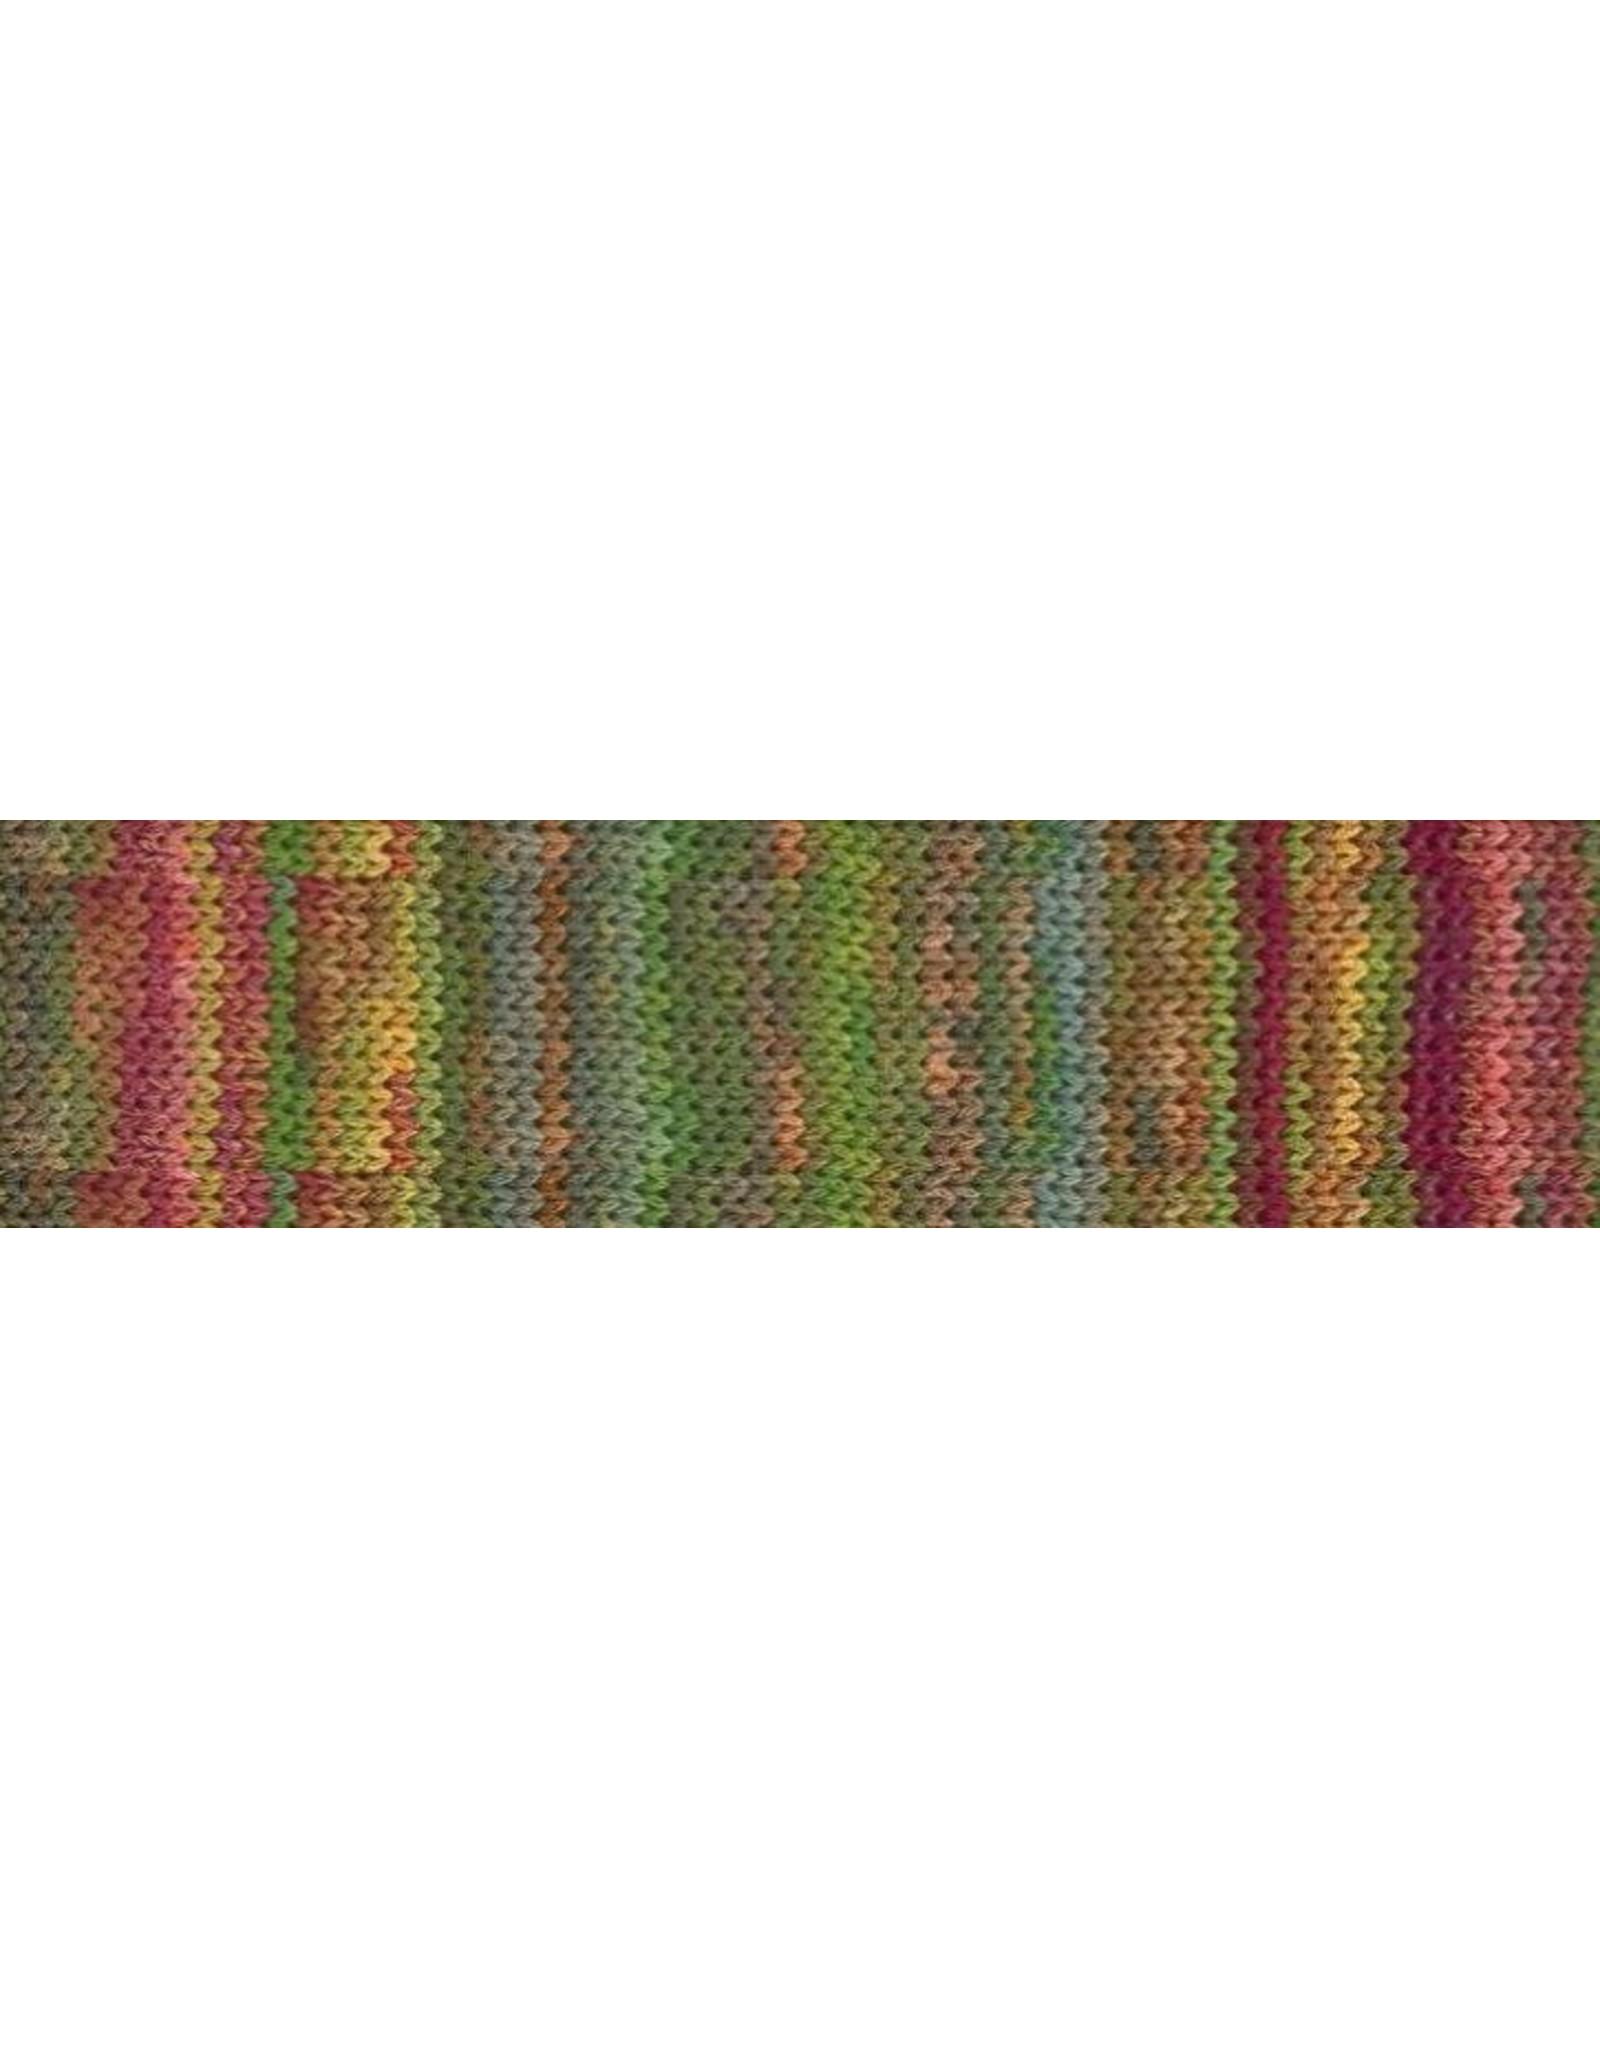 Louisa Harding Louisa Harding: Perris Crochet Shawl Kit,